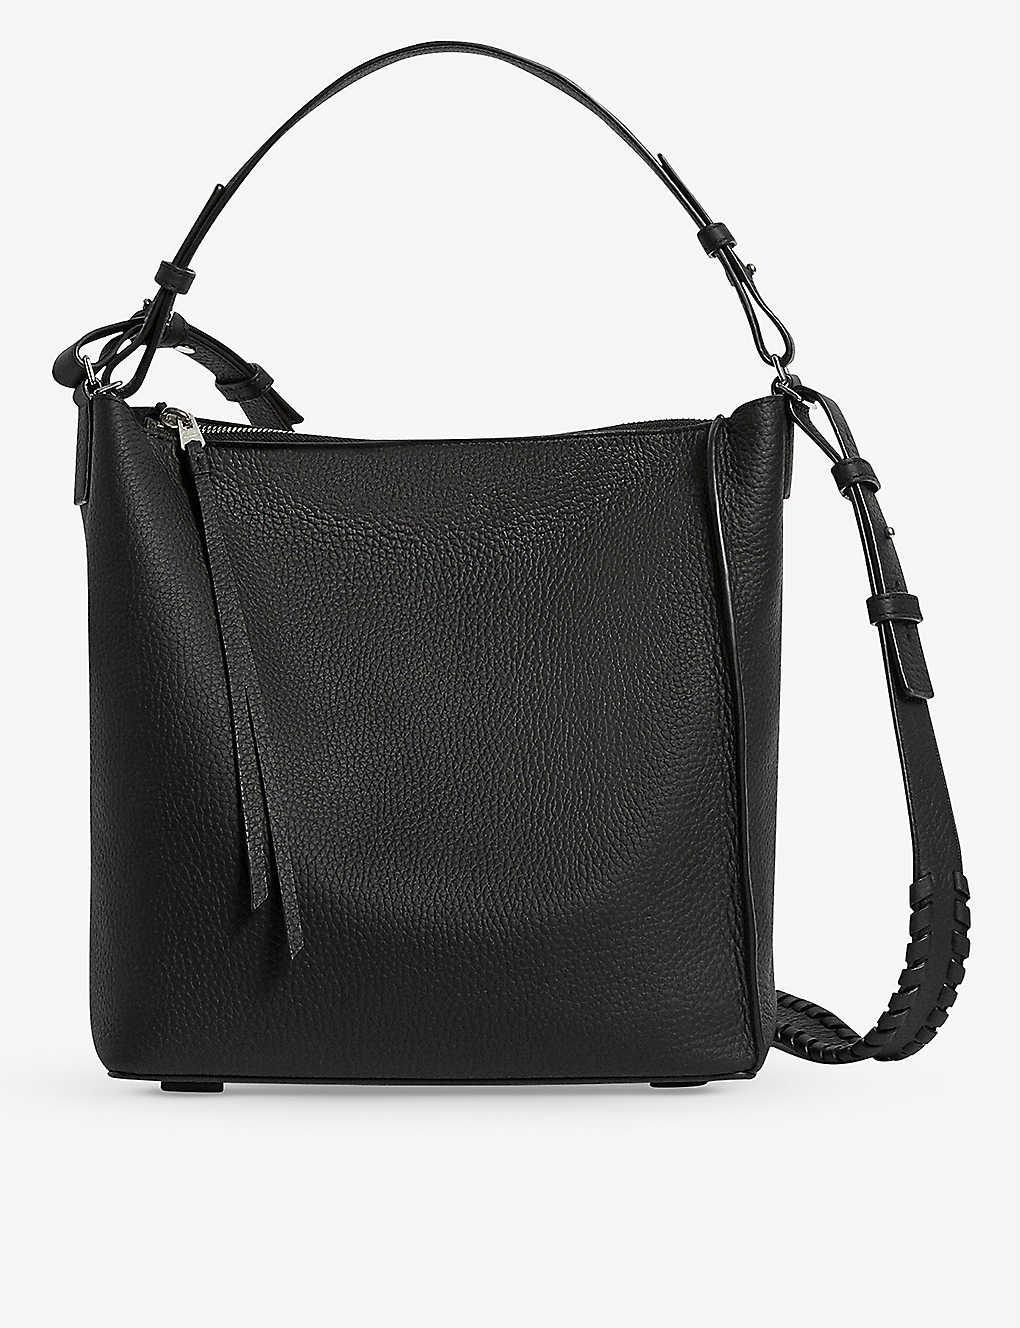 6e6d9dfa59 ALLSAINTS - Kita leather cross-body bag | Selfridges.com